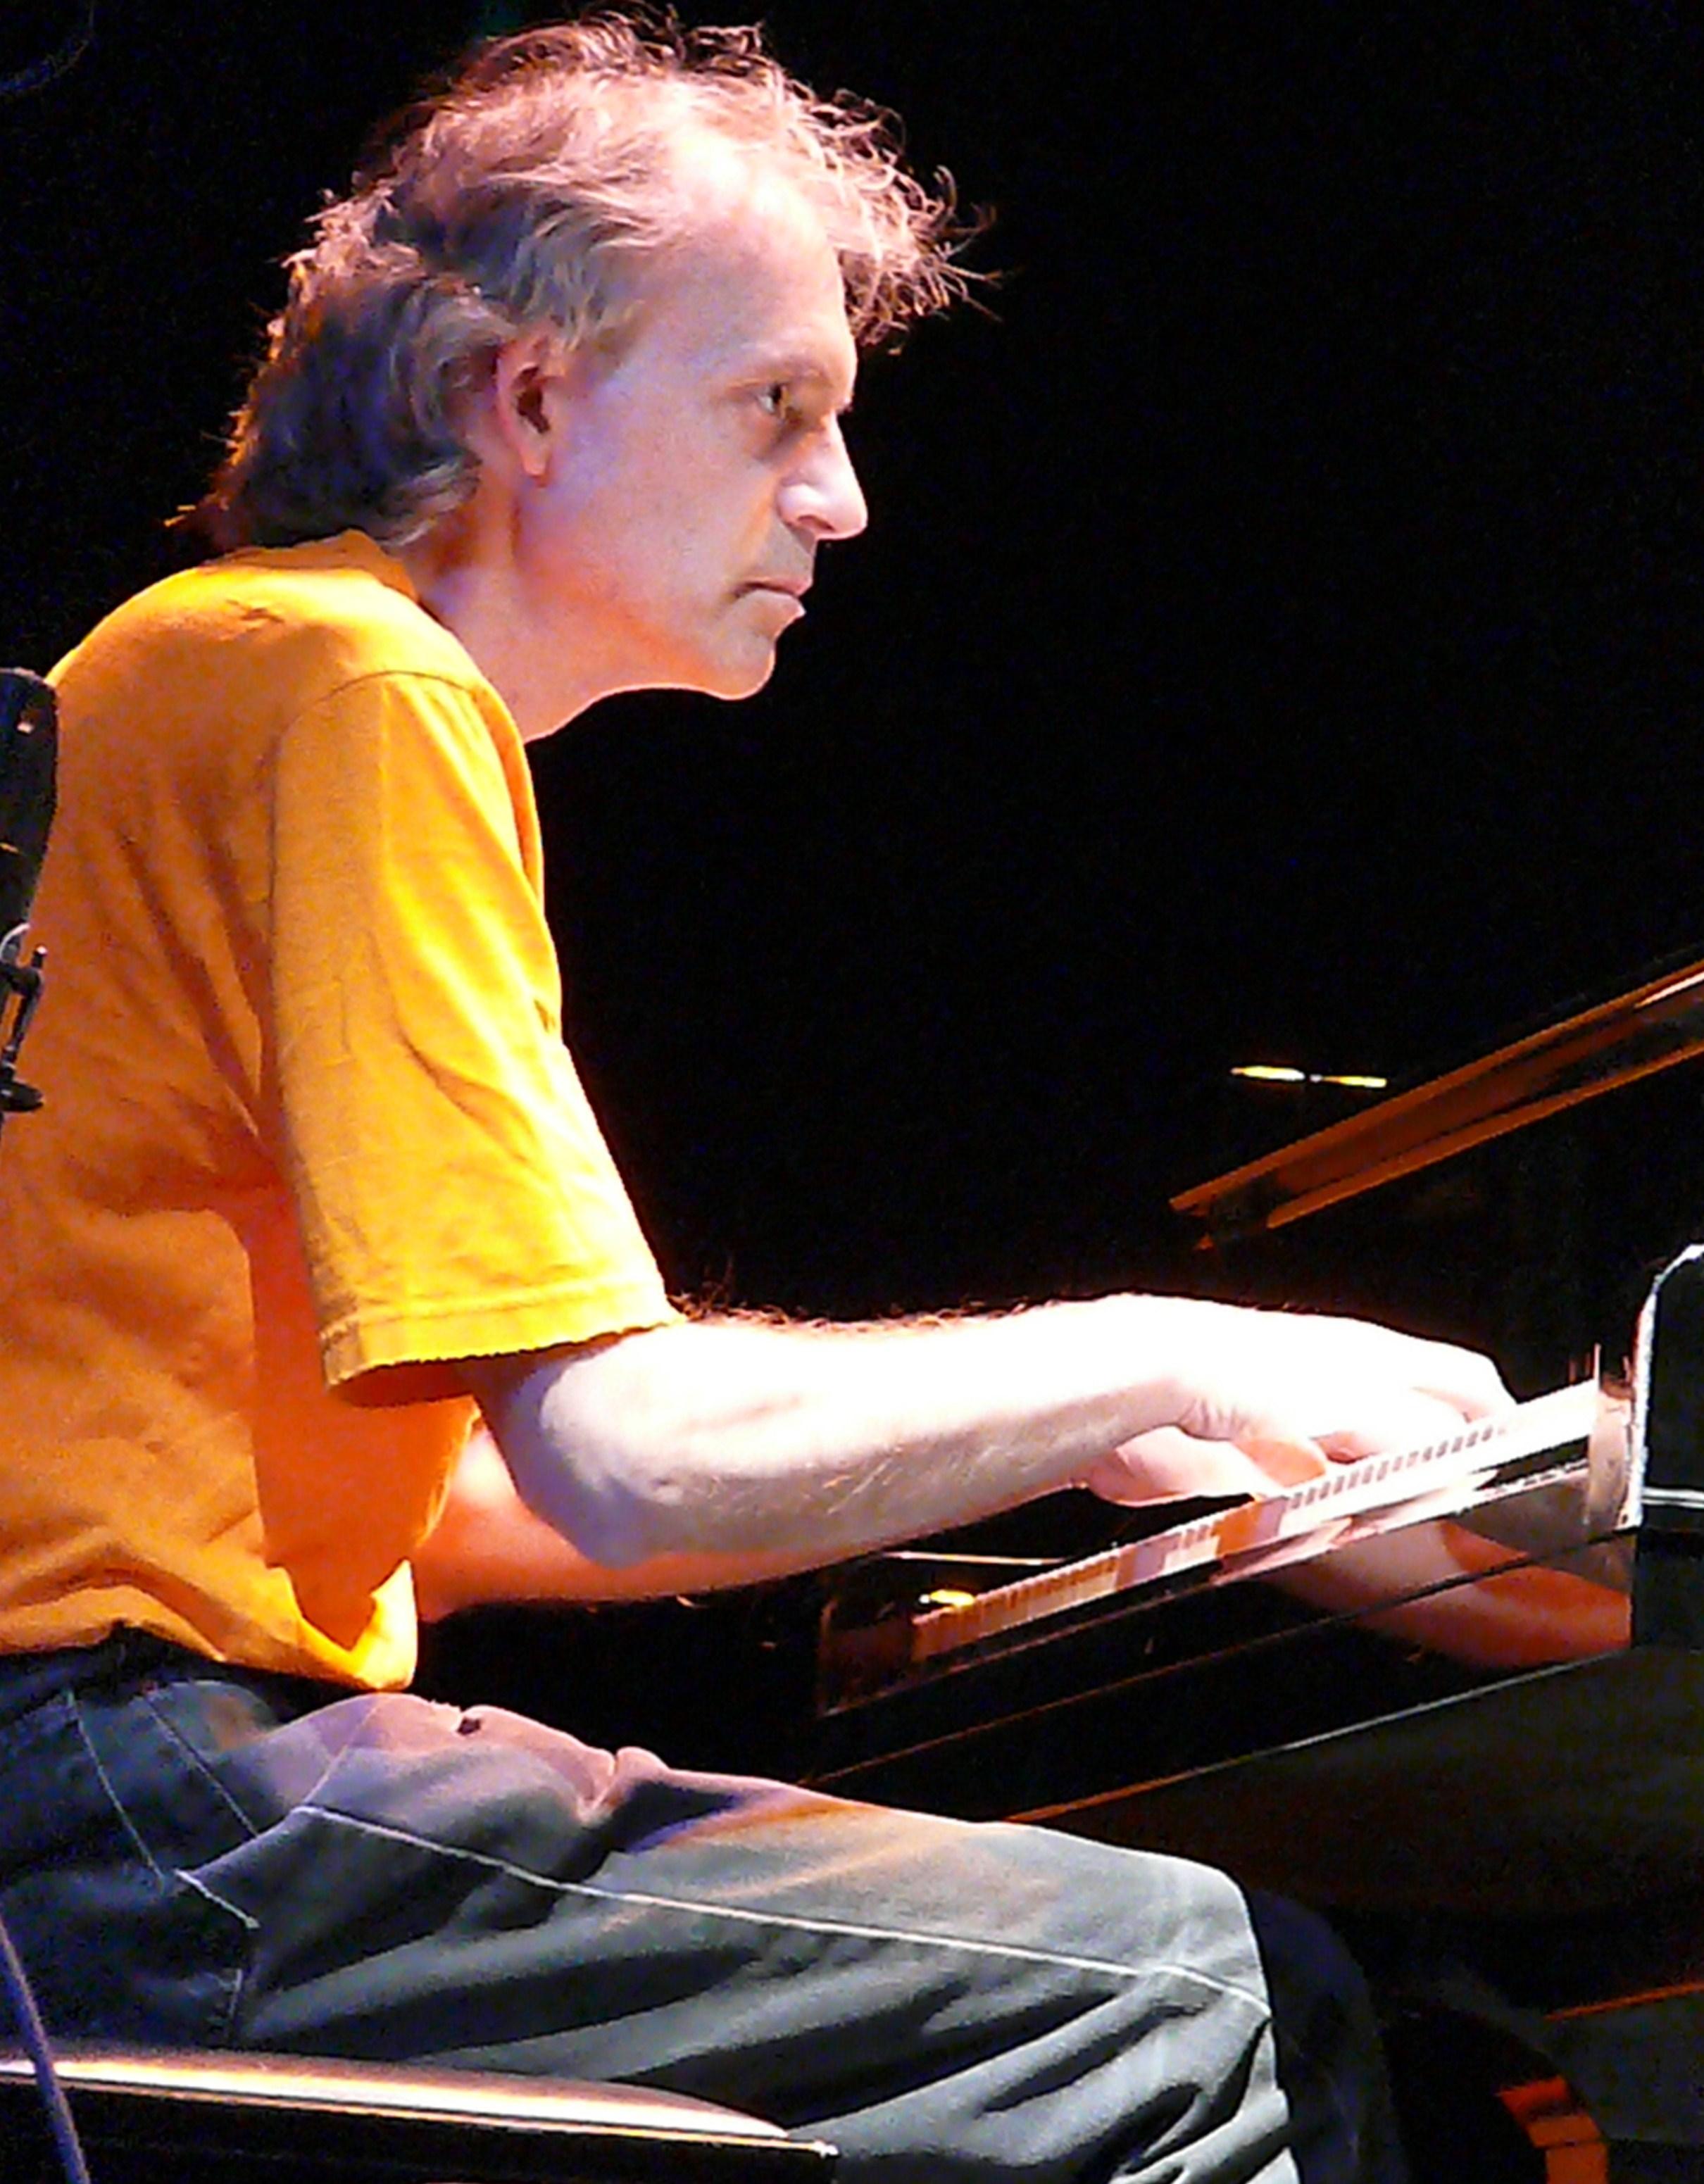 David Arner at Vision Festival 2010